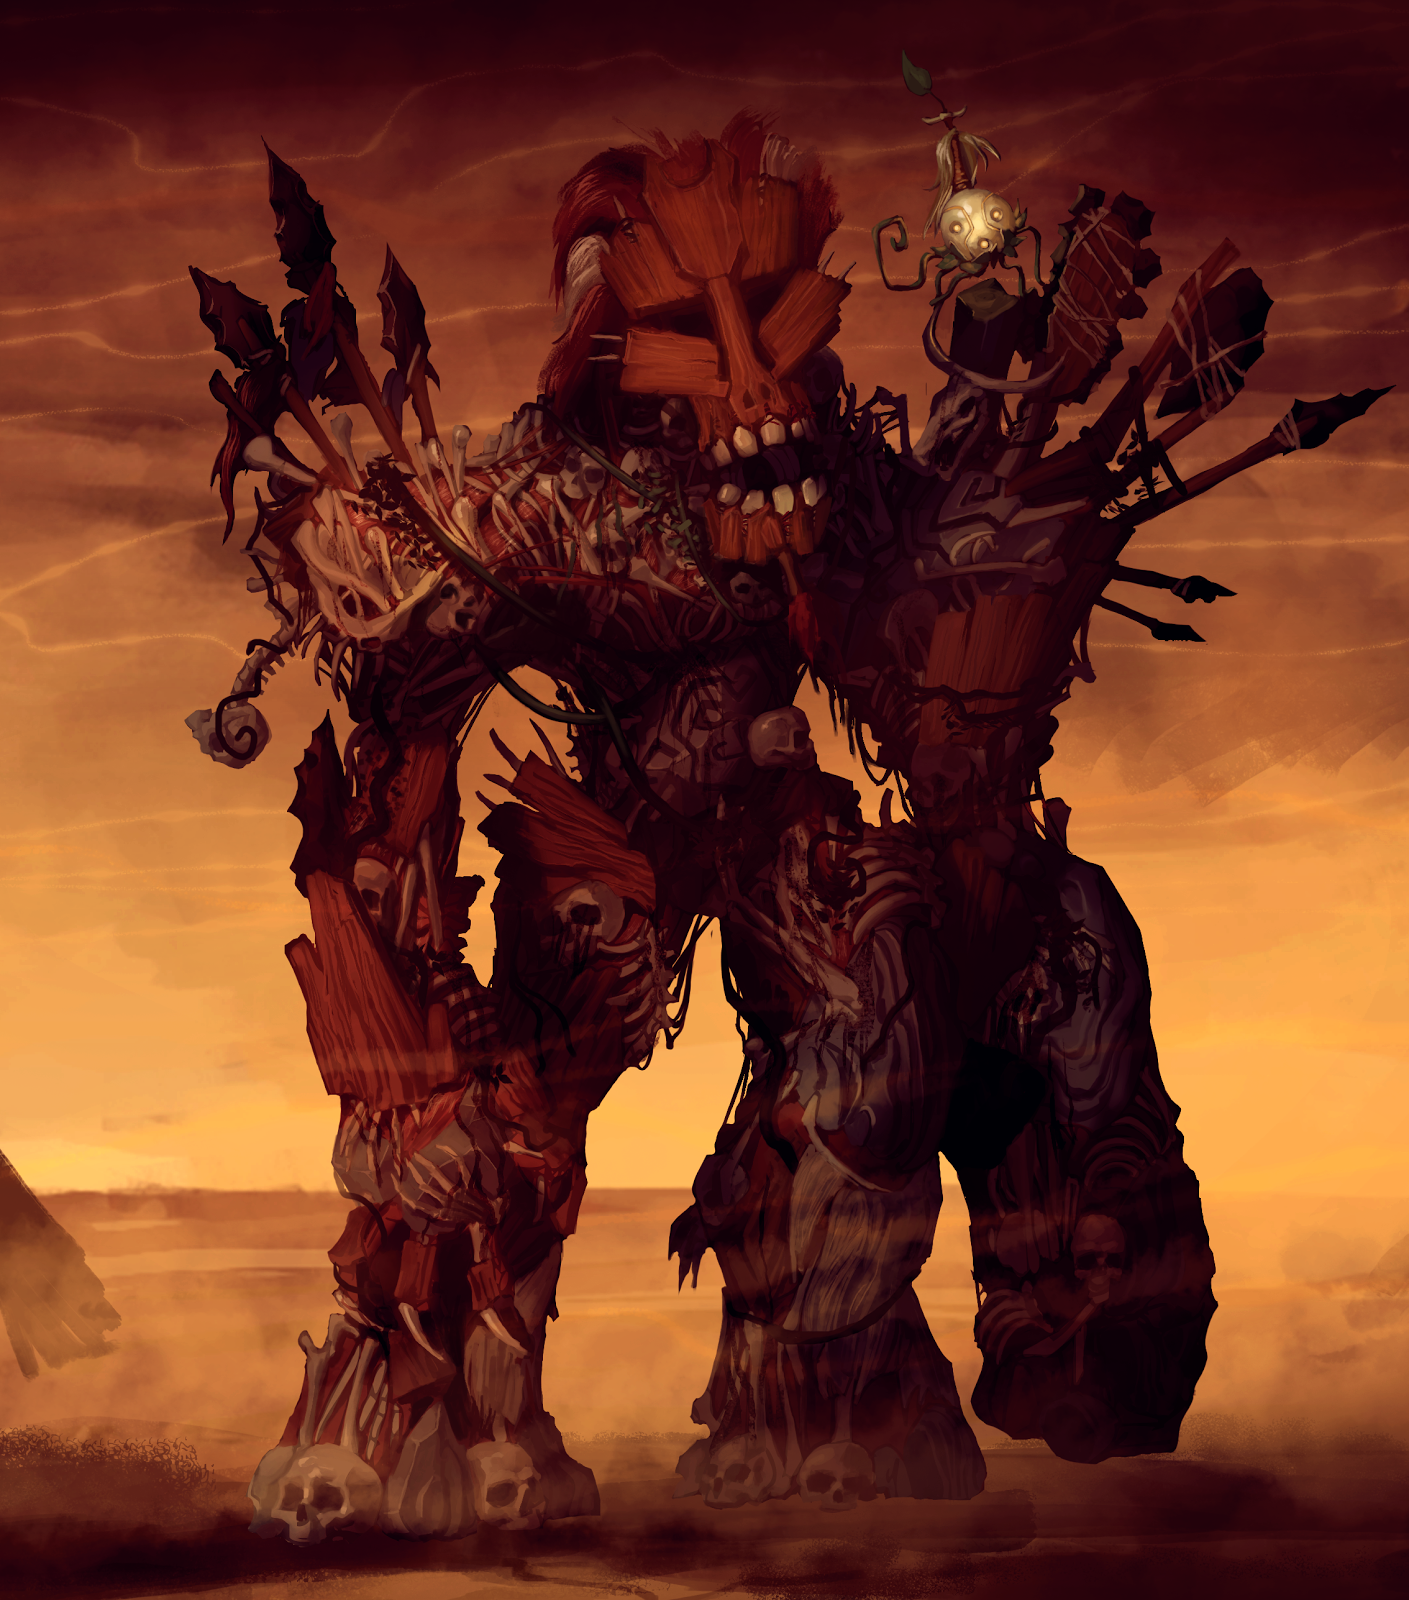 Tix & Juggernaut undungeon